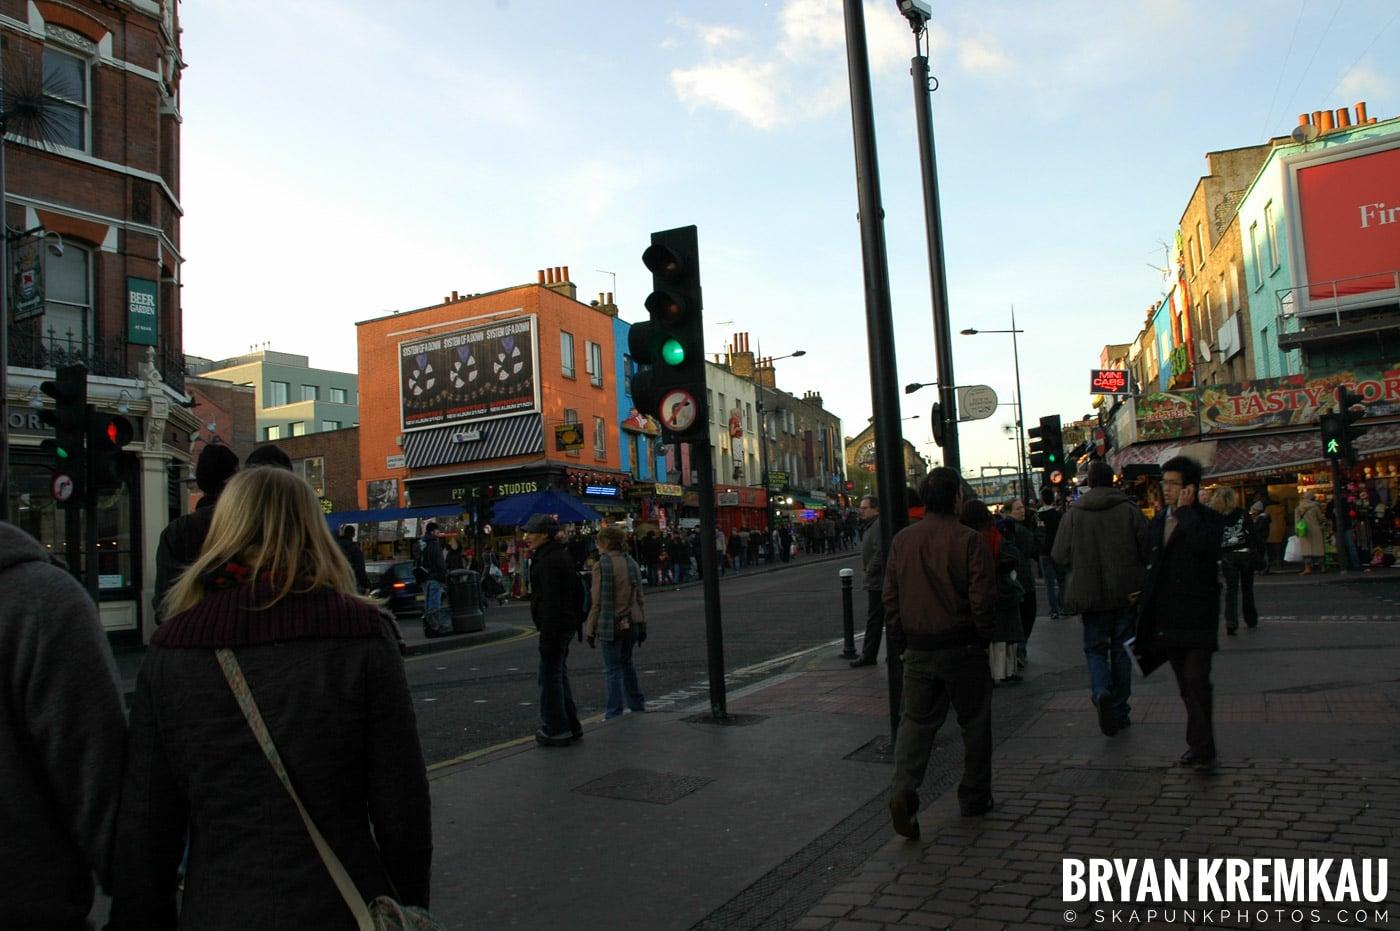 London, England - Day 4 - 12.19.05 (12)